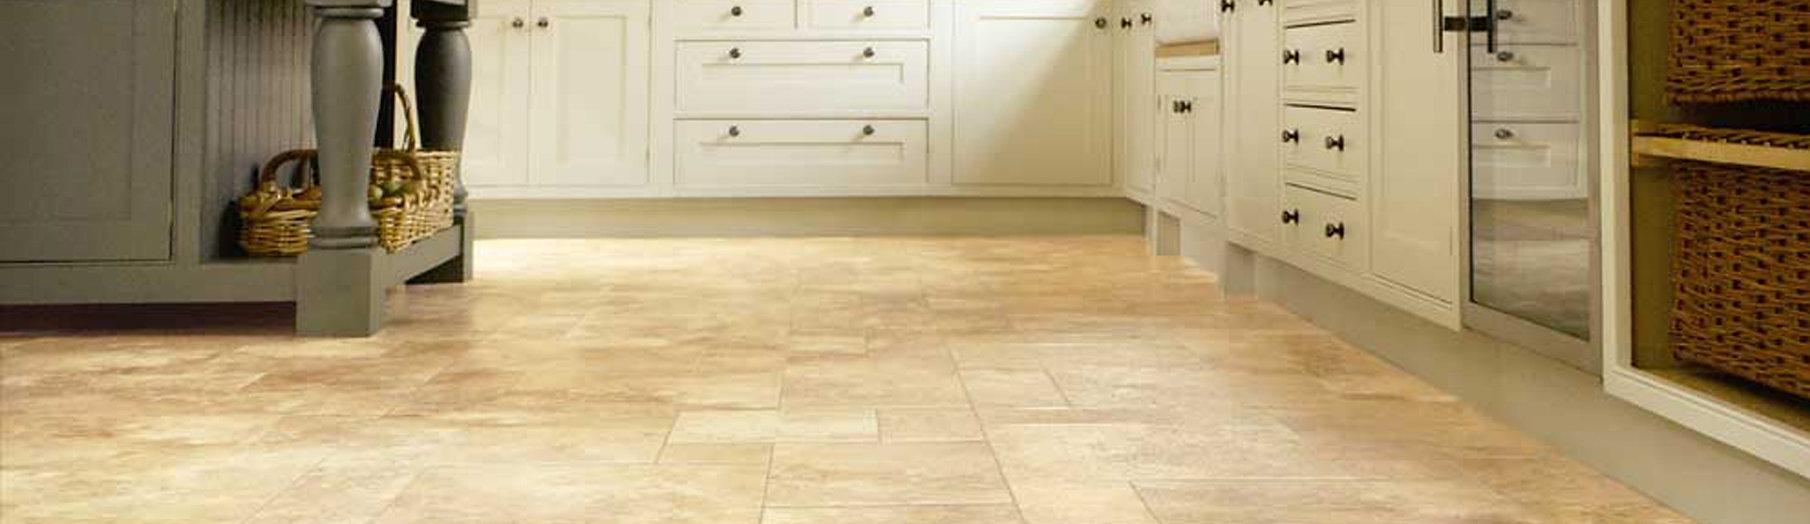 Marble, Concrete, Travertine Polishing